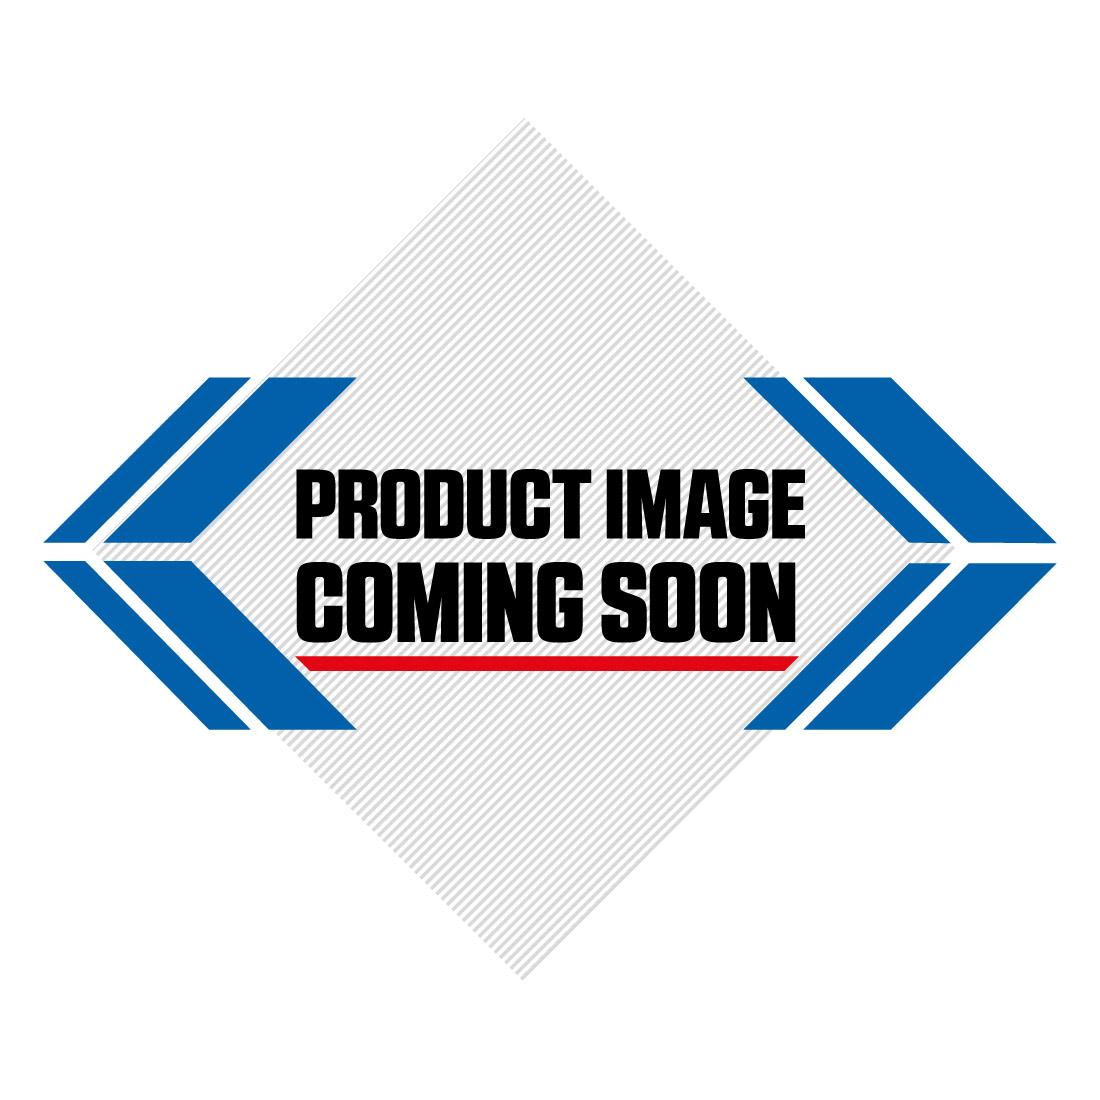 2018 Sidi Crossfire 3 SRS Cairoli Motocross Boots - Ltd Ed Yellow Flo White Image-3